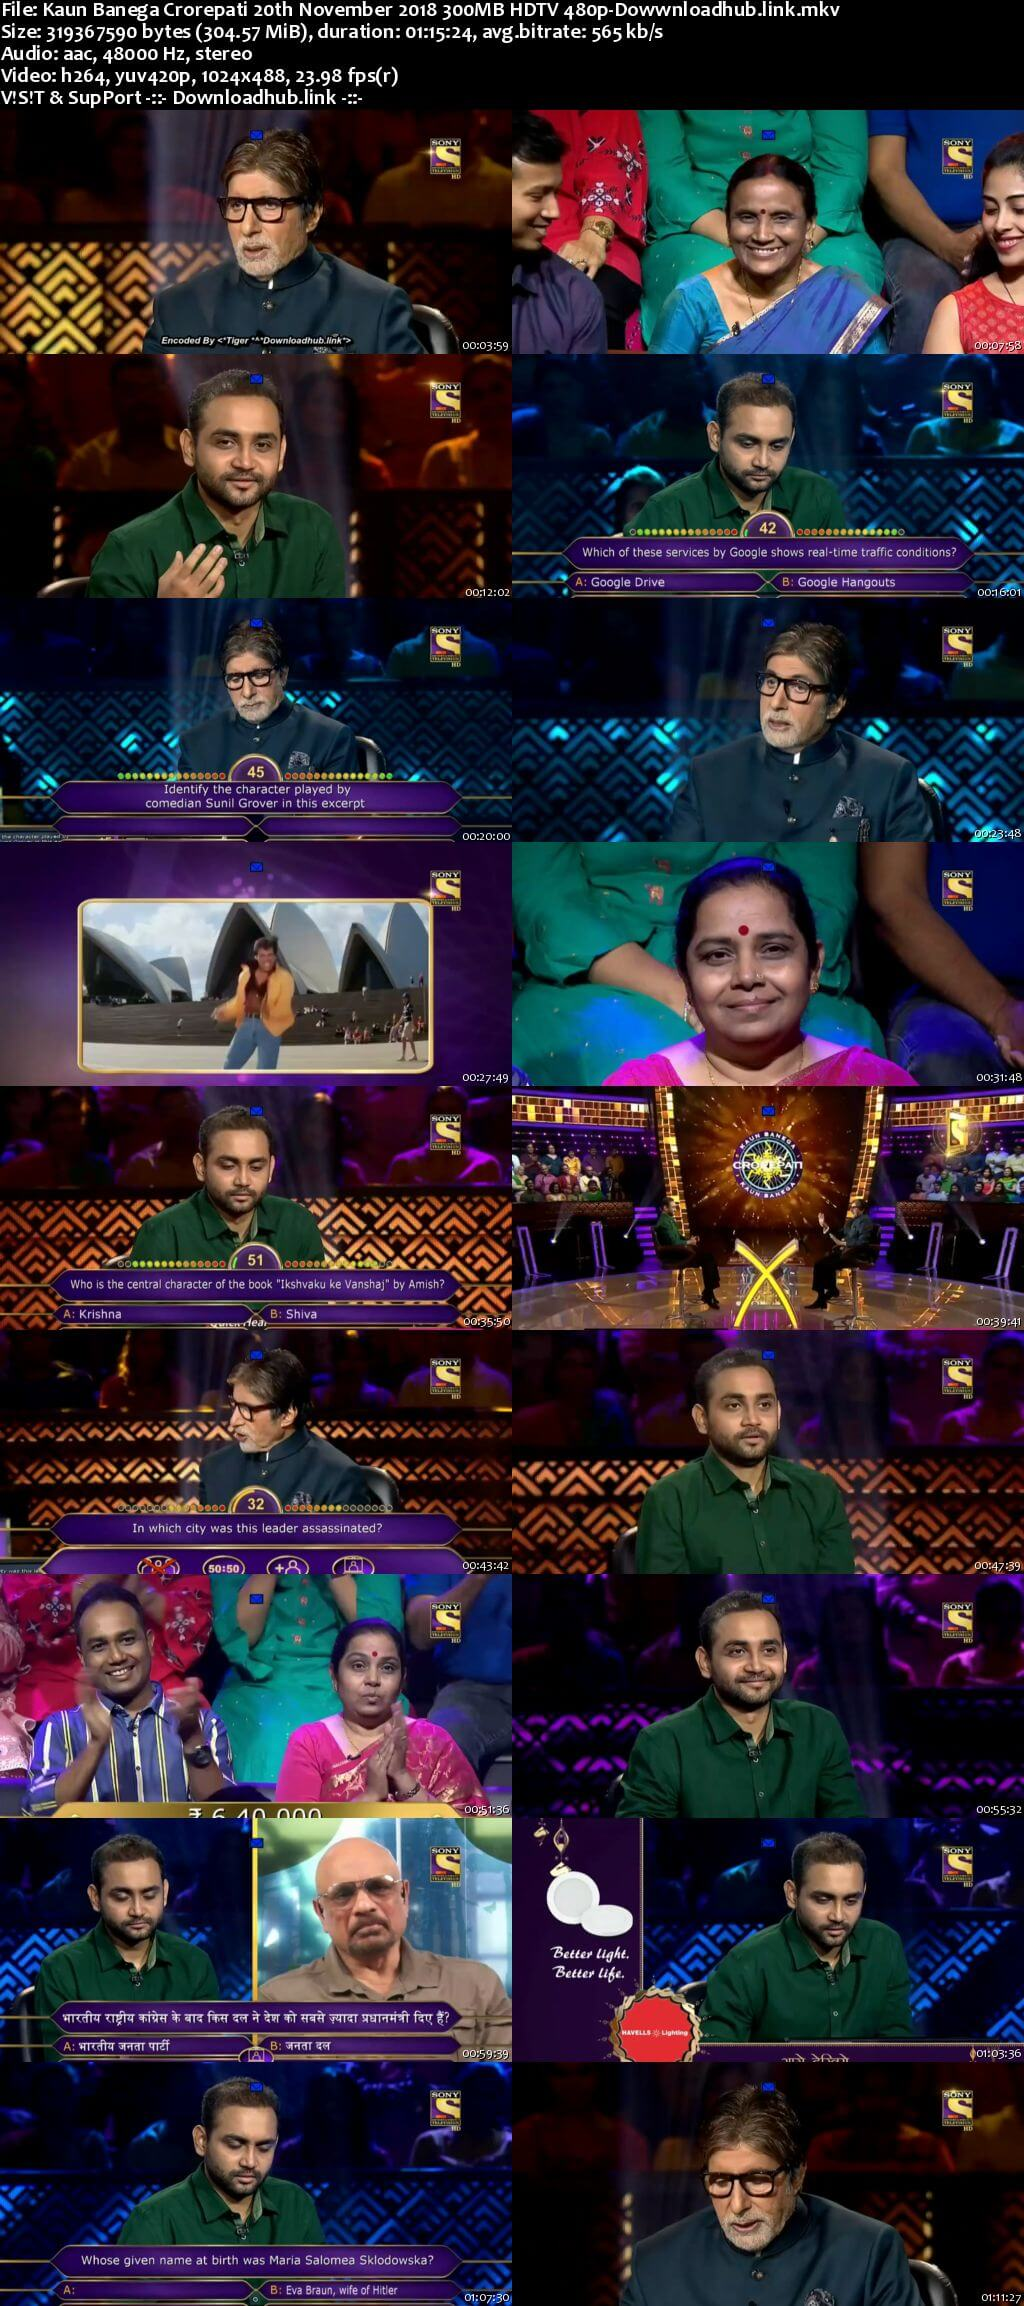 Kaun Banega Crorepati 20th November 2018 300MB HDTV 480p